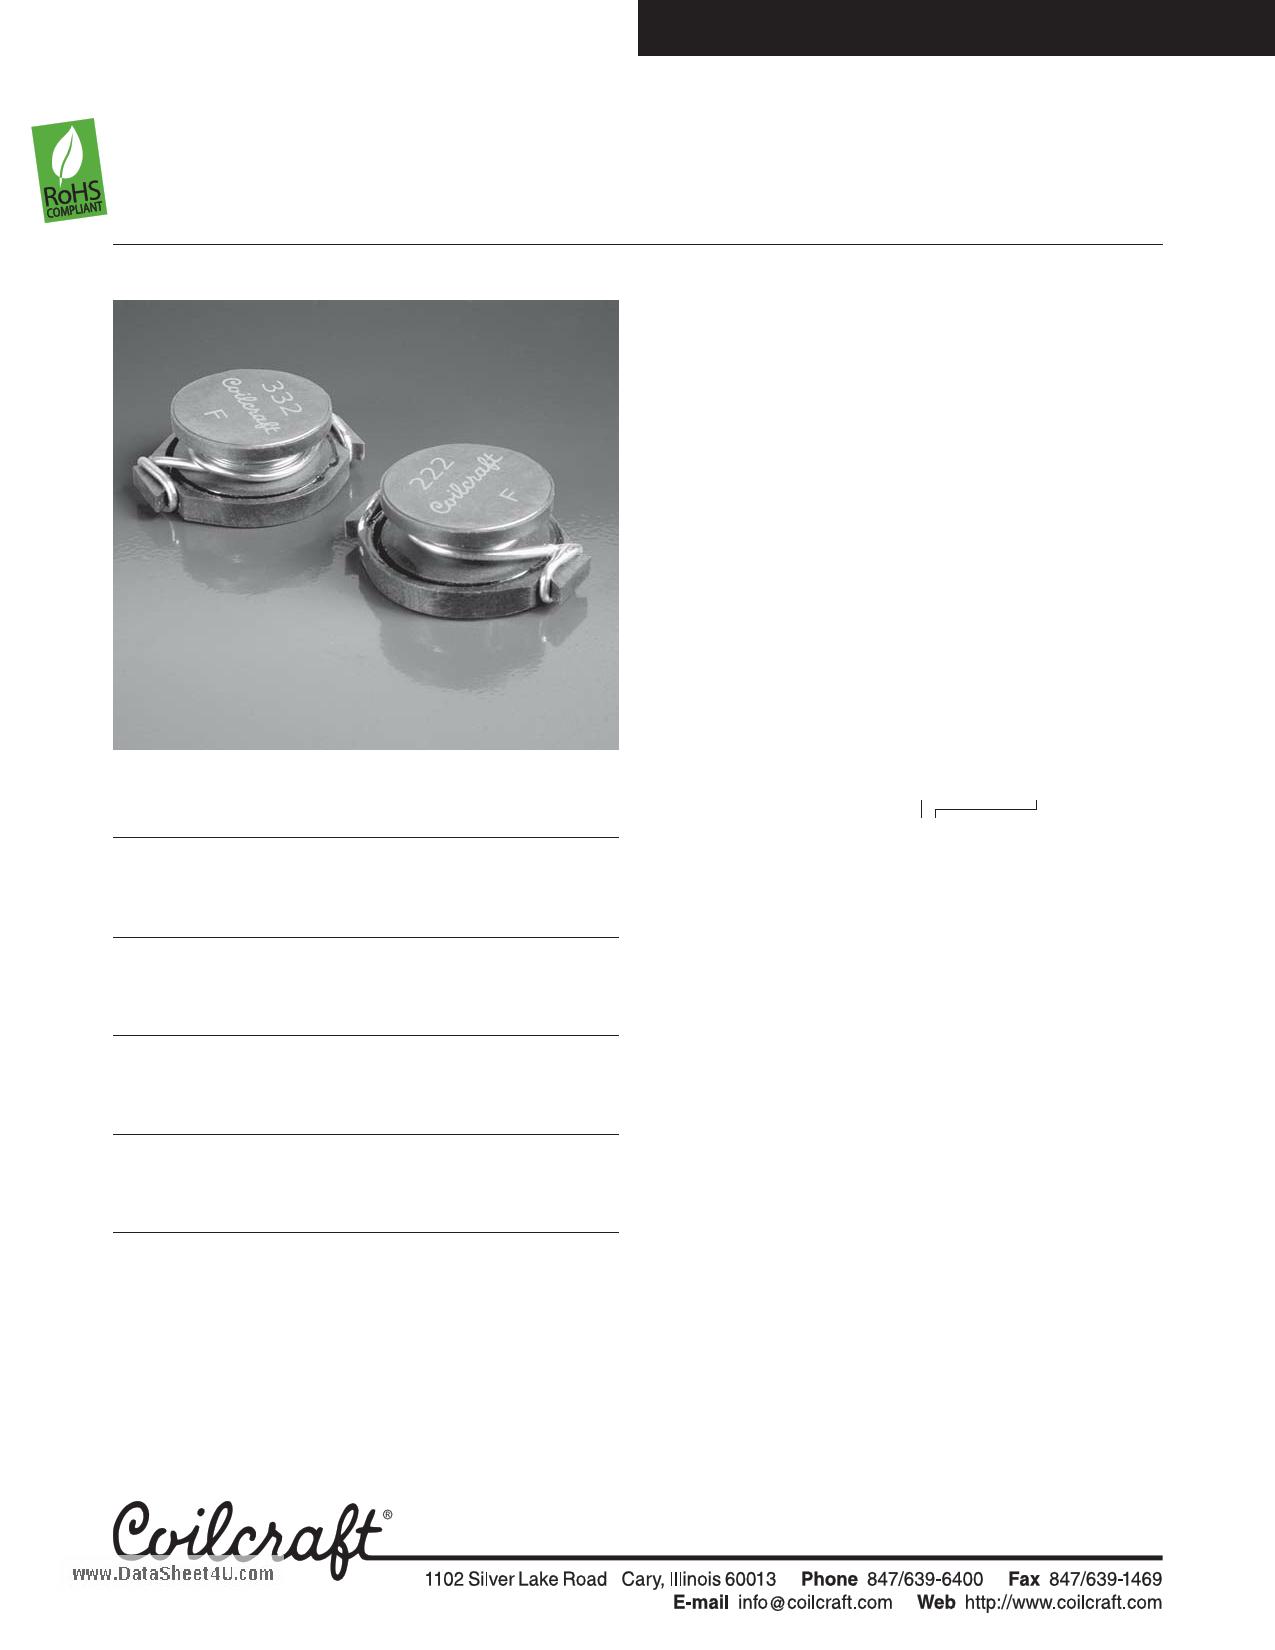 DO5010H-104MLD Datasheet, DO5010H-104MLD PDF,ピン配置, 機能